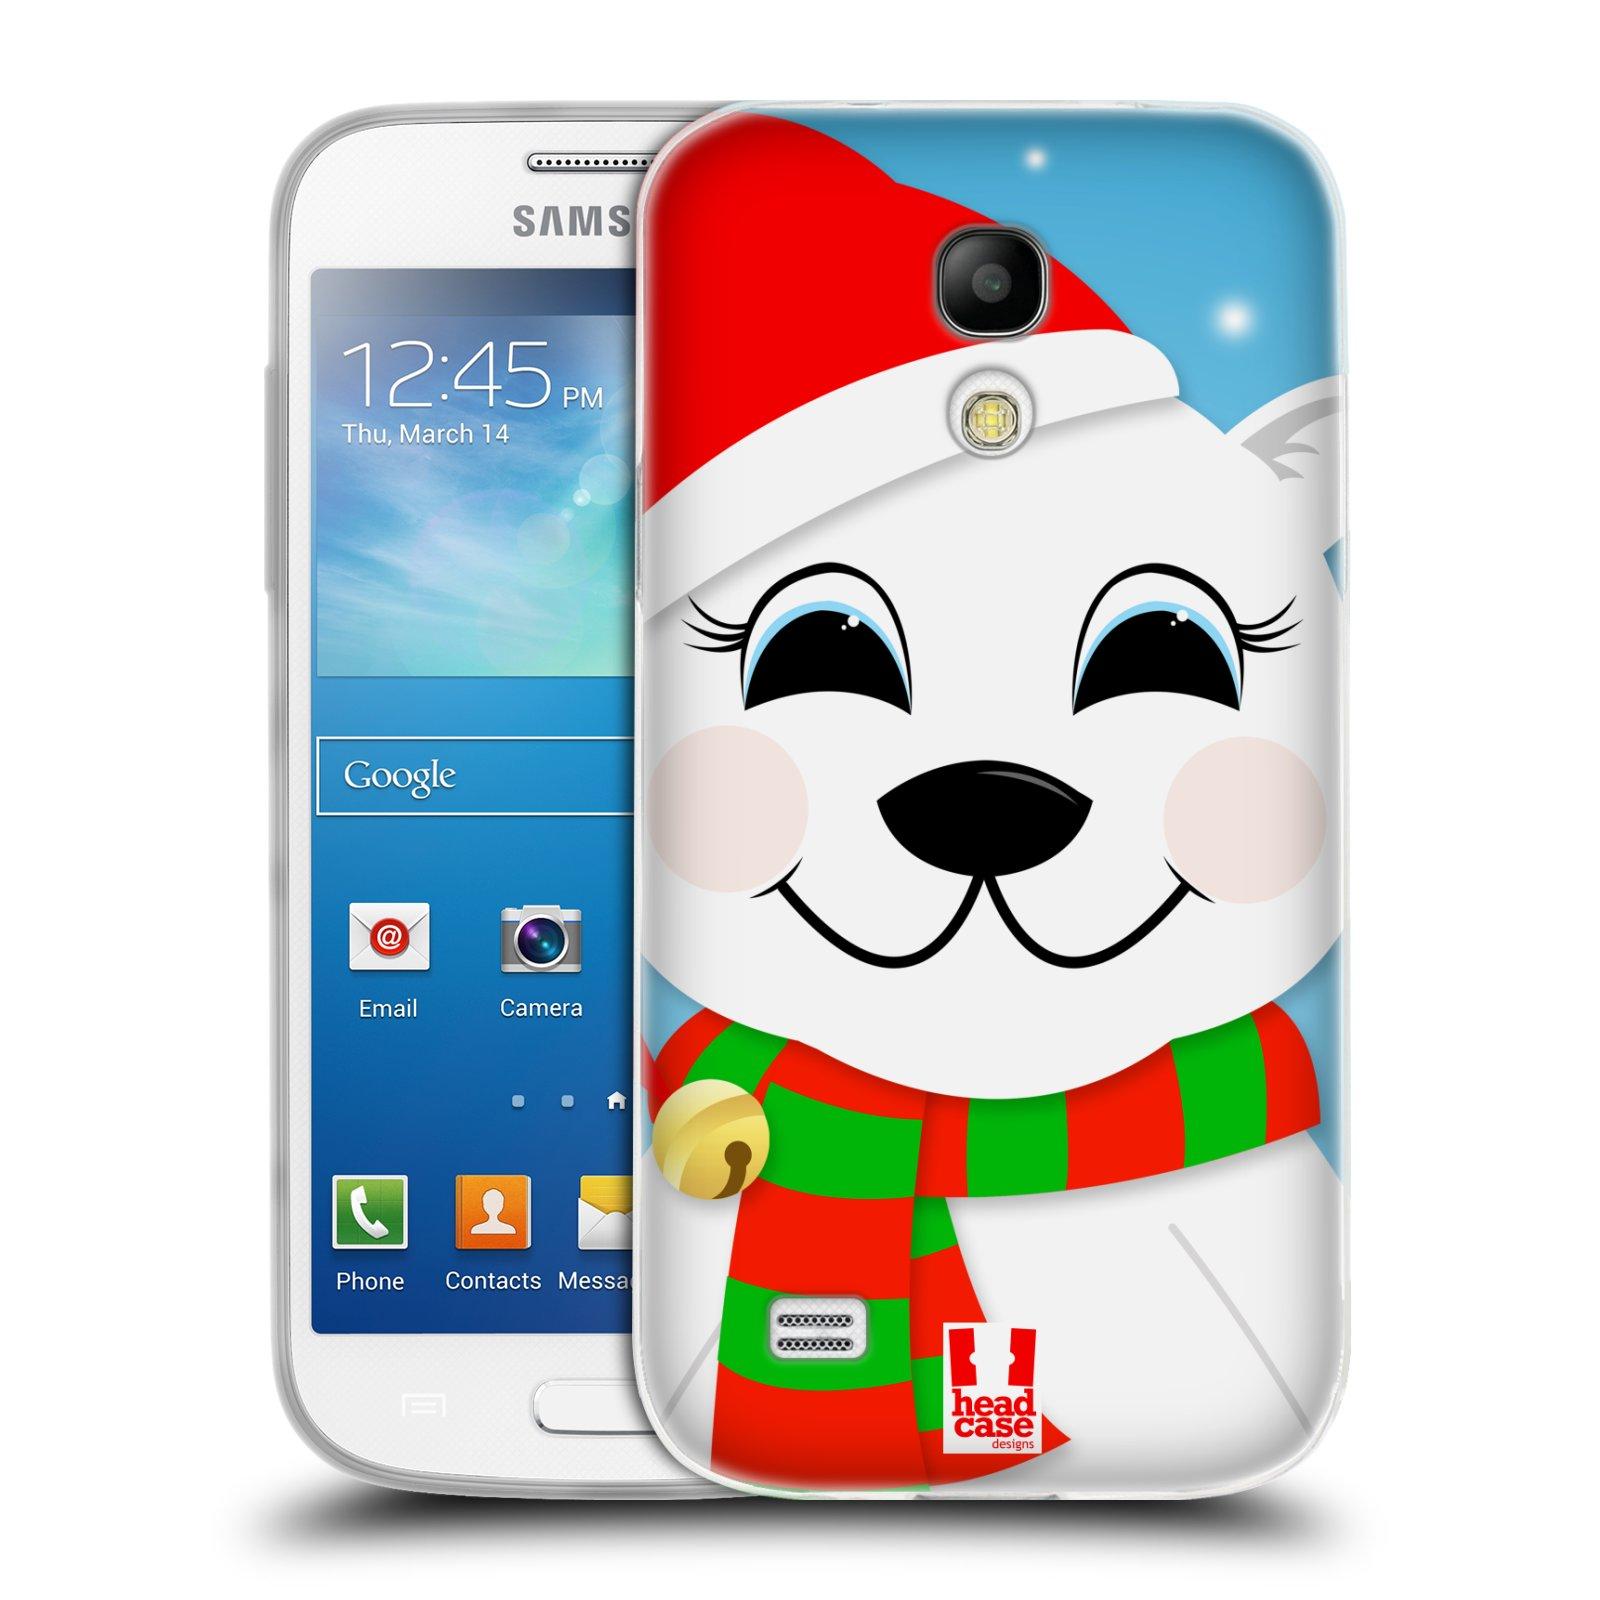 Silikonové pouzdro na mobil Samsung Galaxy S4 Mini HEAD CASE VÁNOCE POLÁRNÍ MÉĎA (Silikonový kryt či obal na mobilní telefon Samsung Galaxy S4 Mini GT-i9195 / i9190 (nepasuje na verzi Black Edition))